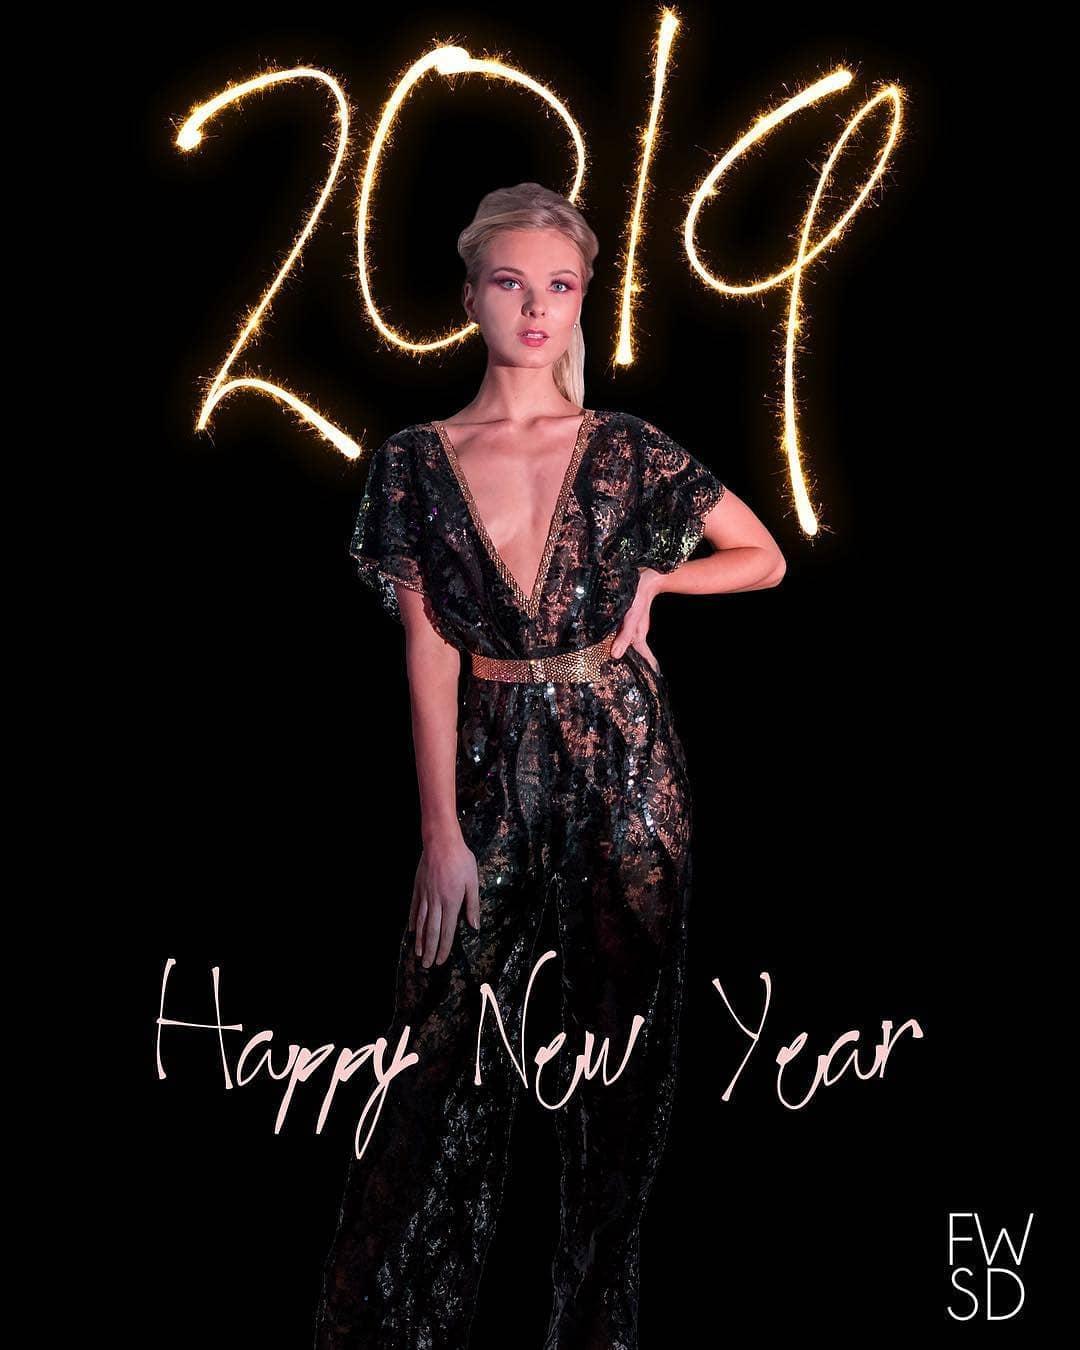 PHOTO_HAPPY NEW YEAR 2019.jpg